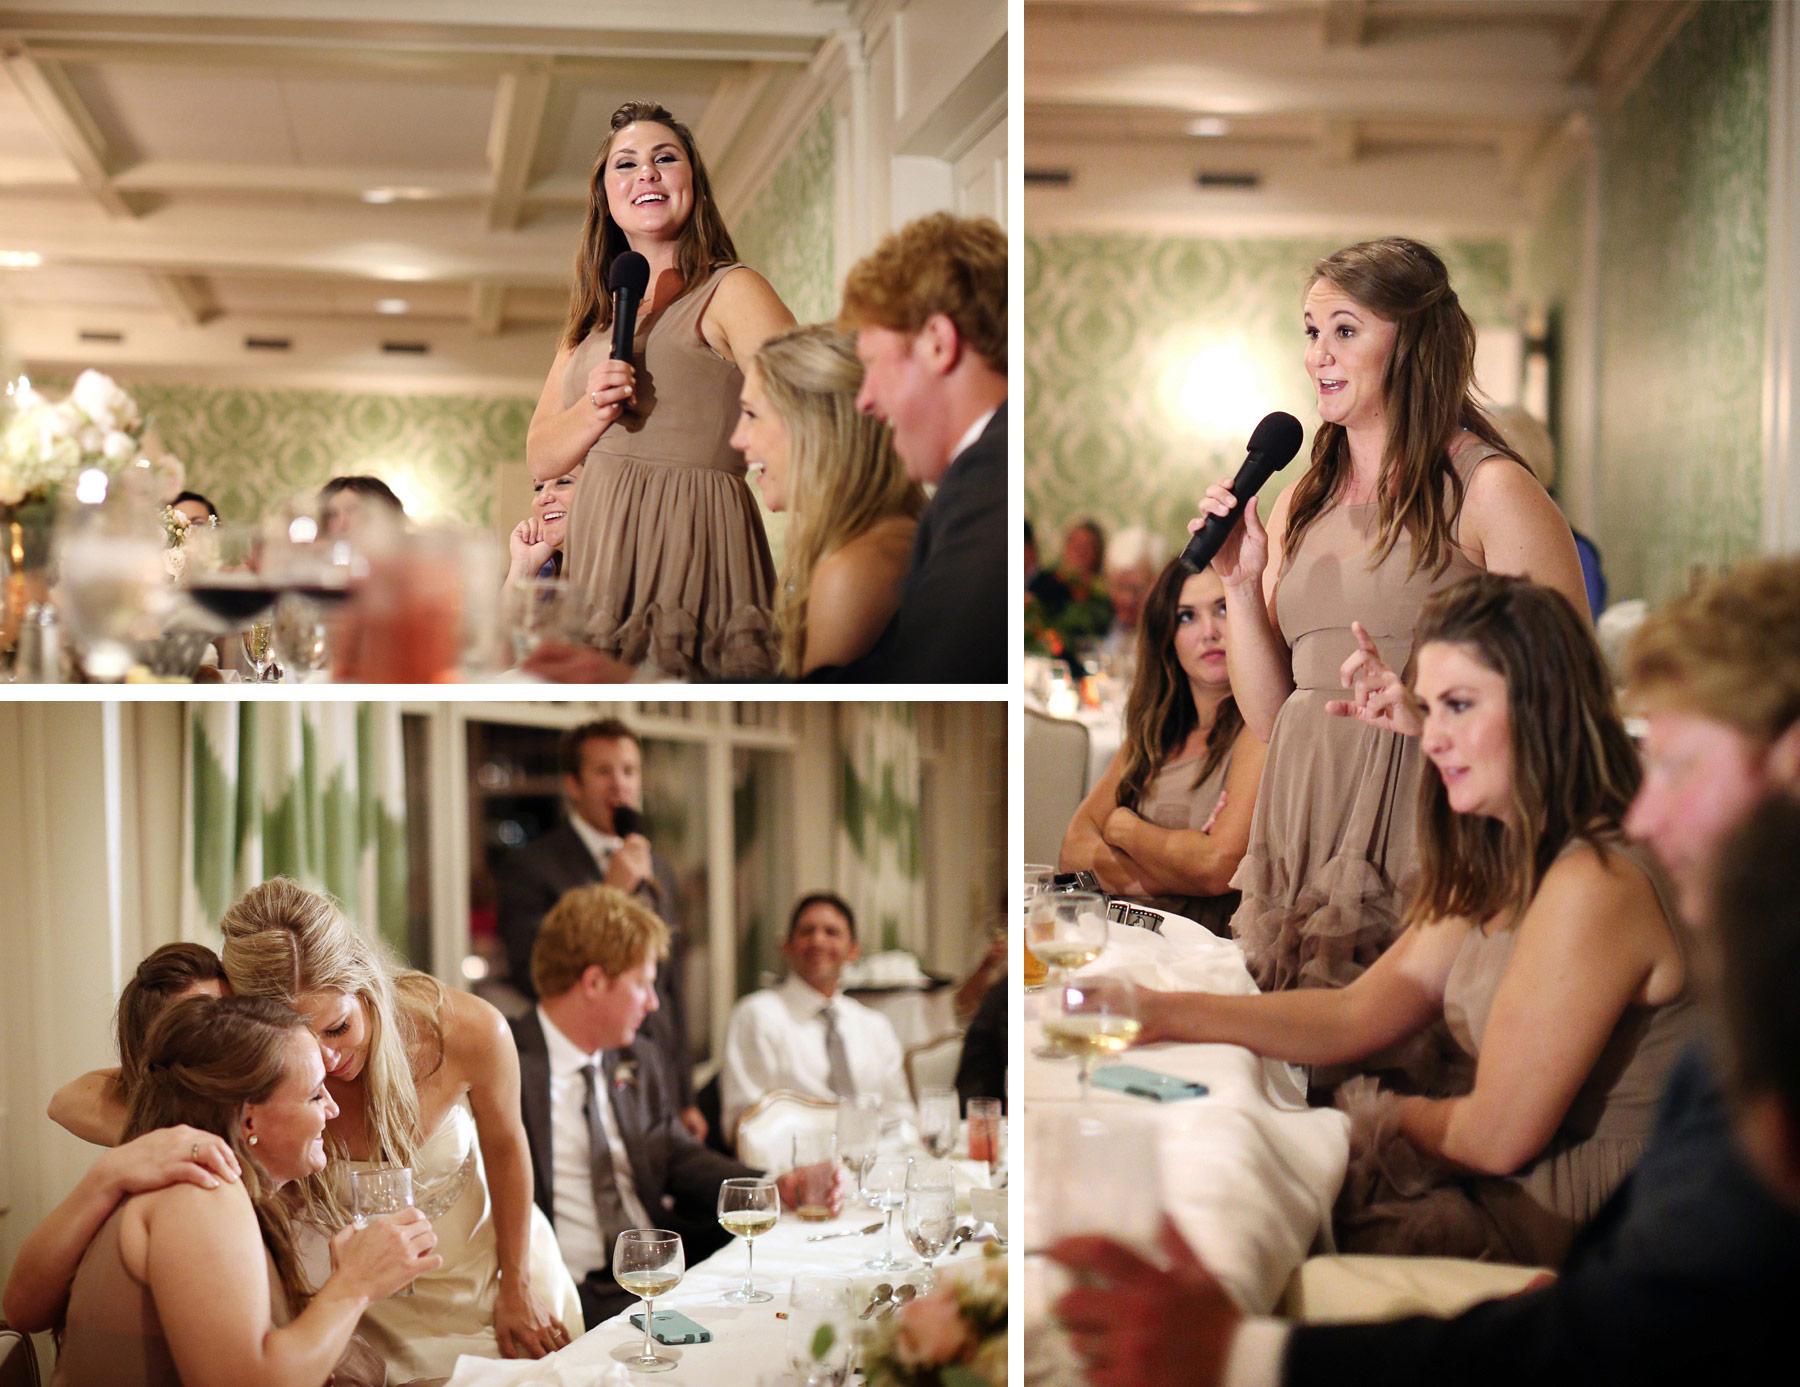 20-Minneapolis-Minnesota-Wedding-Photographer-by-Andrew-Vick-Photography-Fall-Autumn-Minikahda-Club-Reception-Bride-Groom-Speeches-Bridesmaids-Hugs-Embrace-Krissy-and-James.jpg